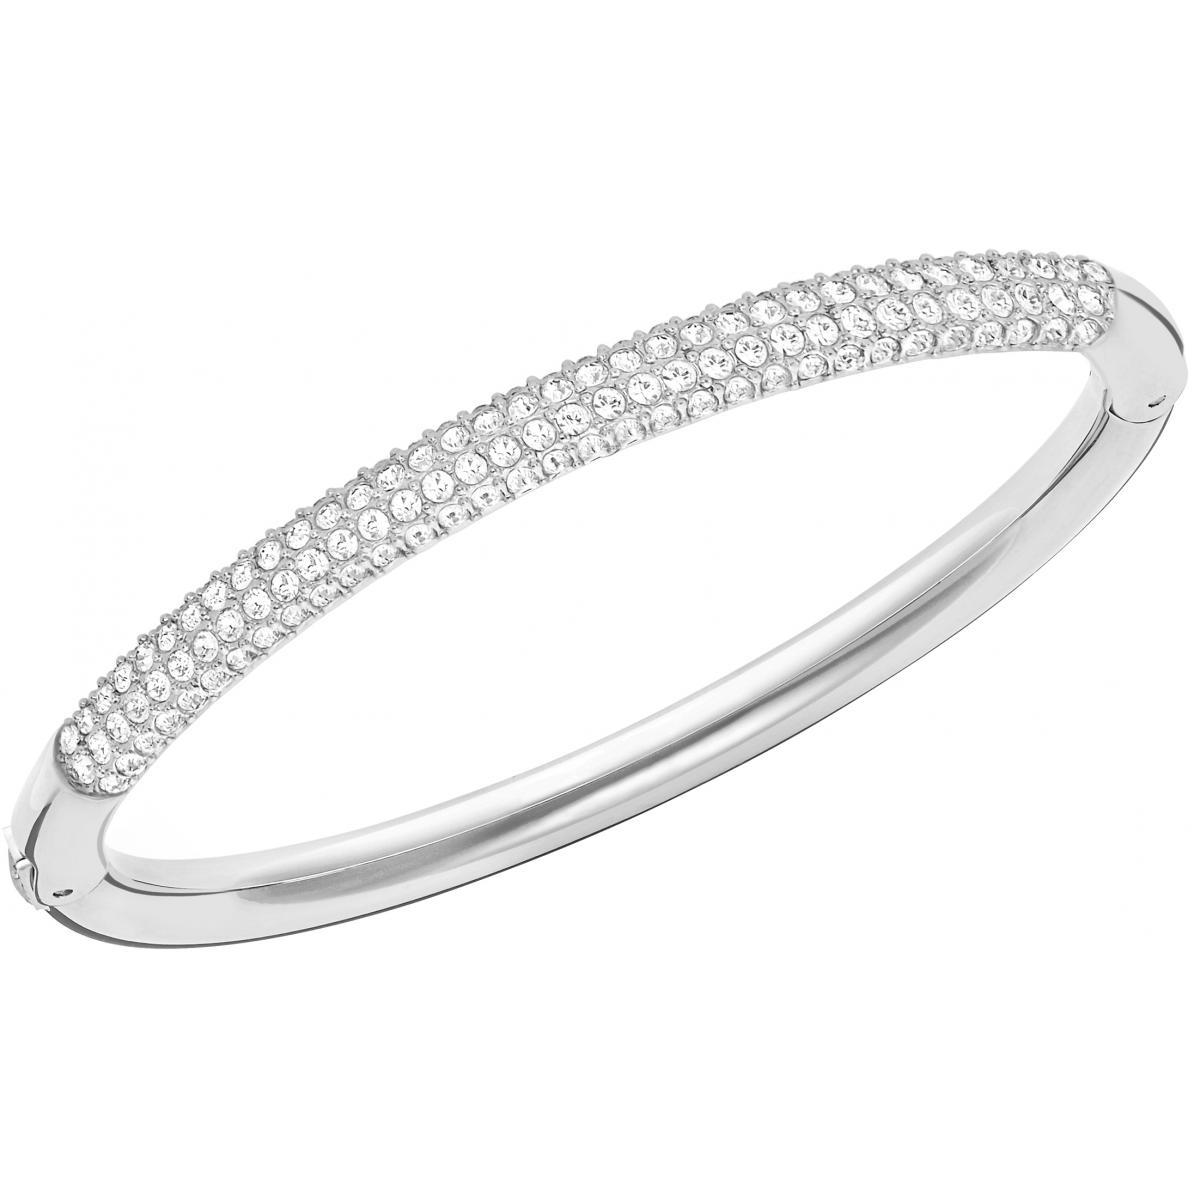 bracelet femme rigide